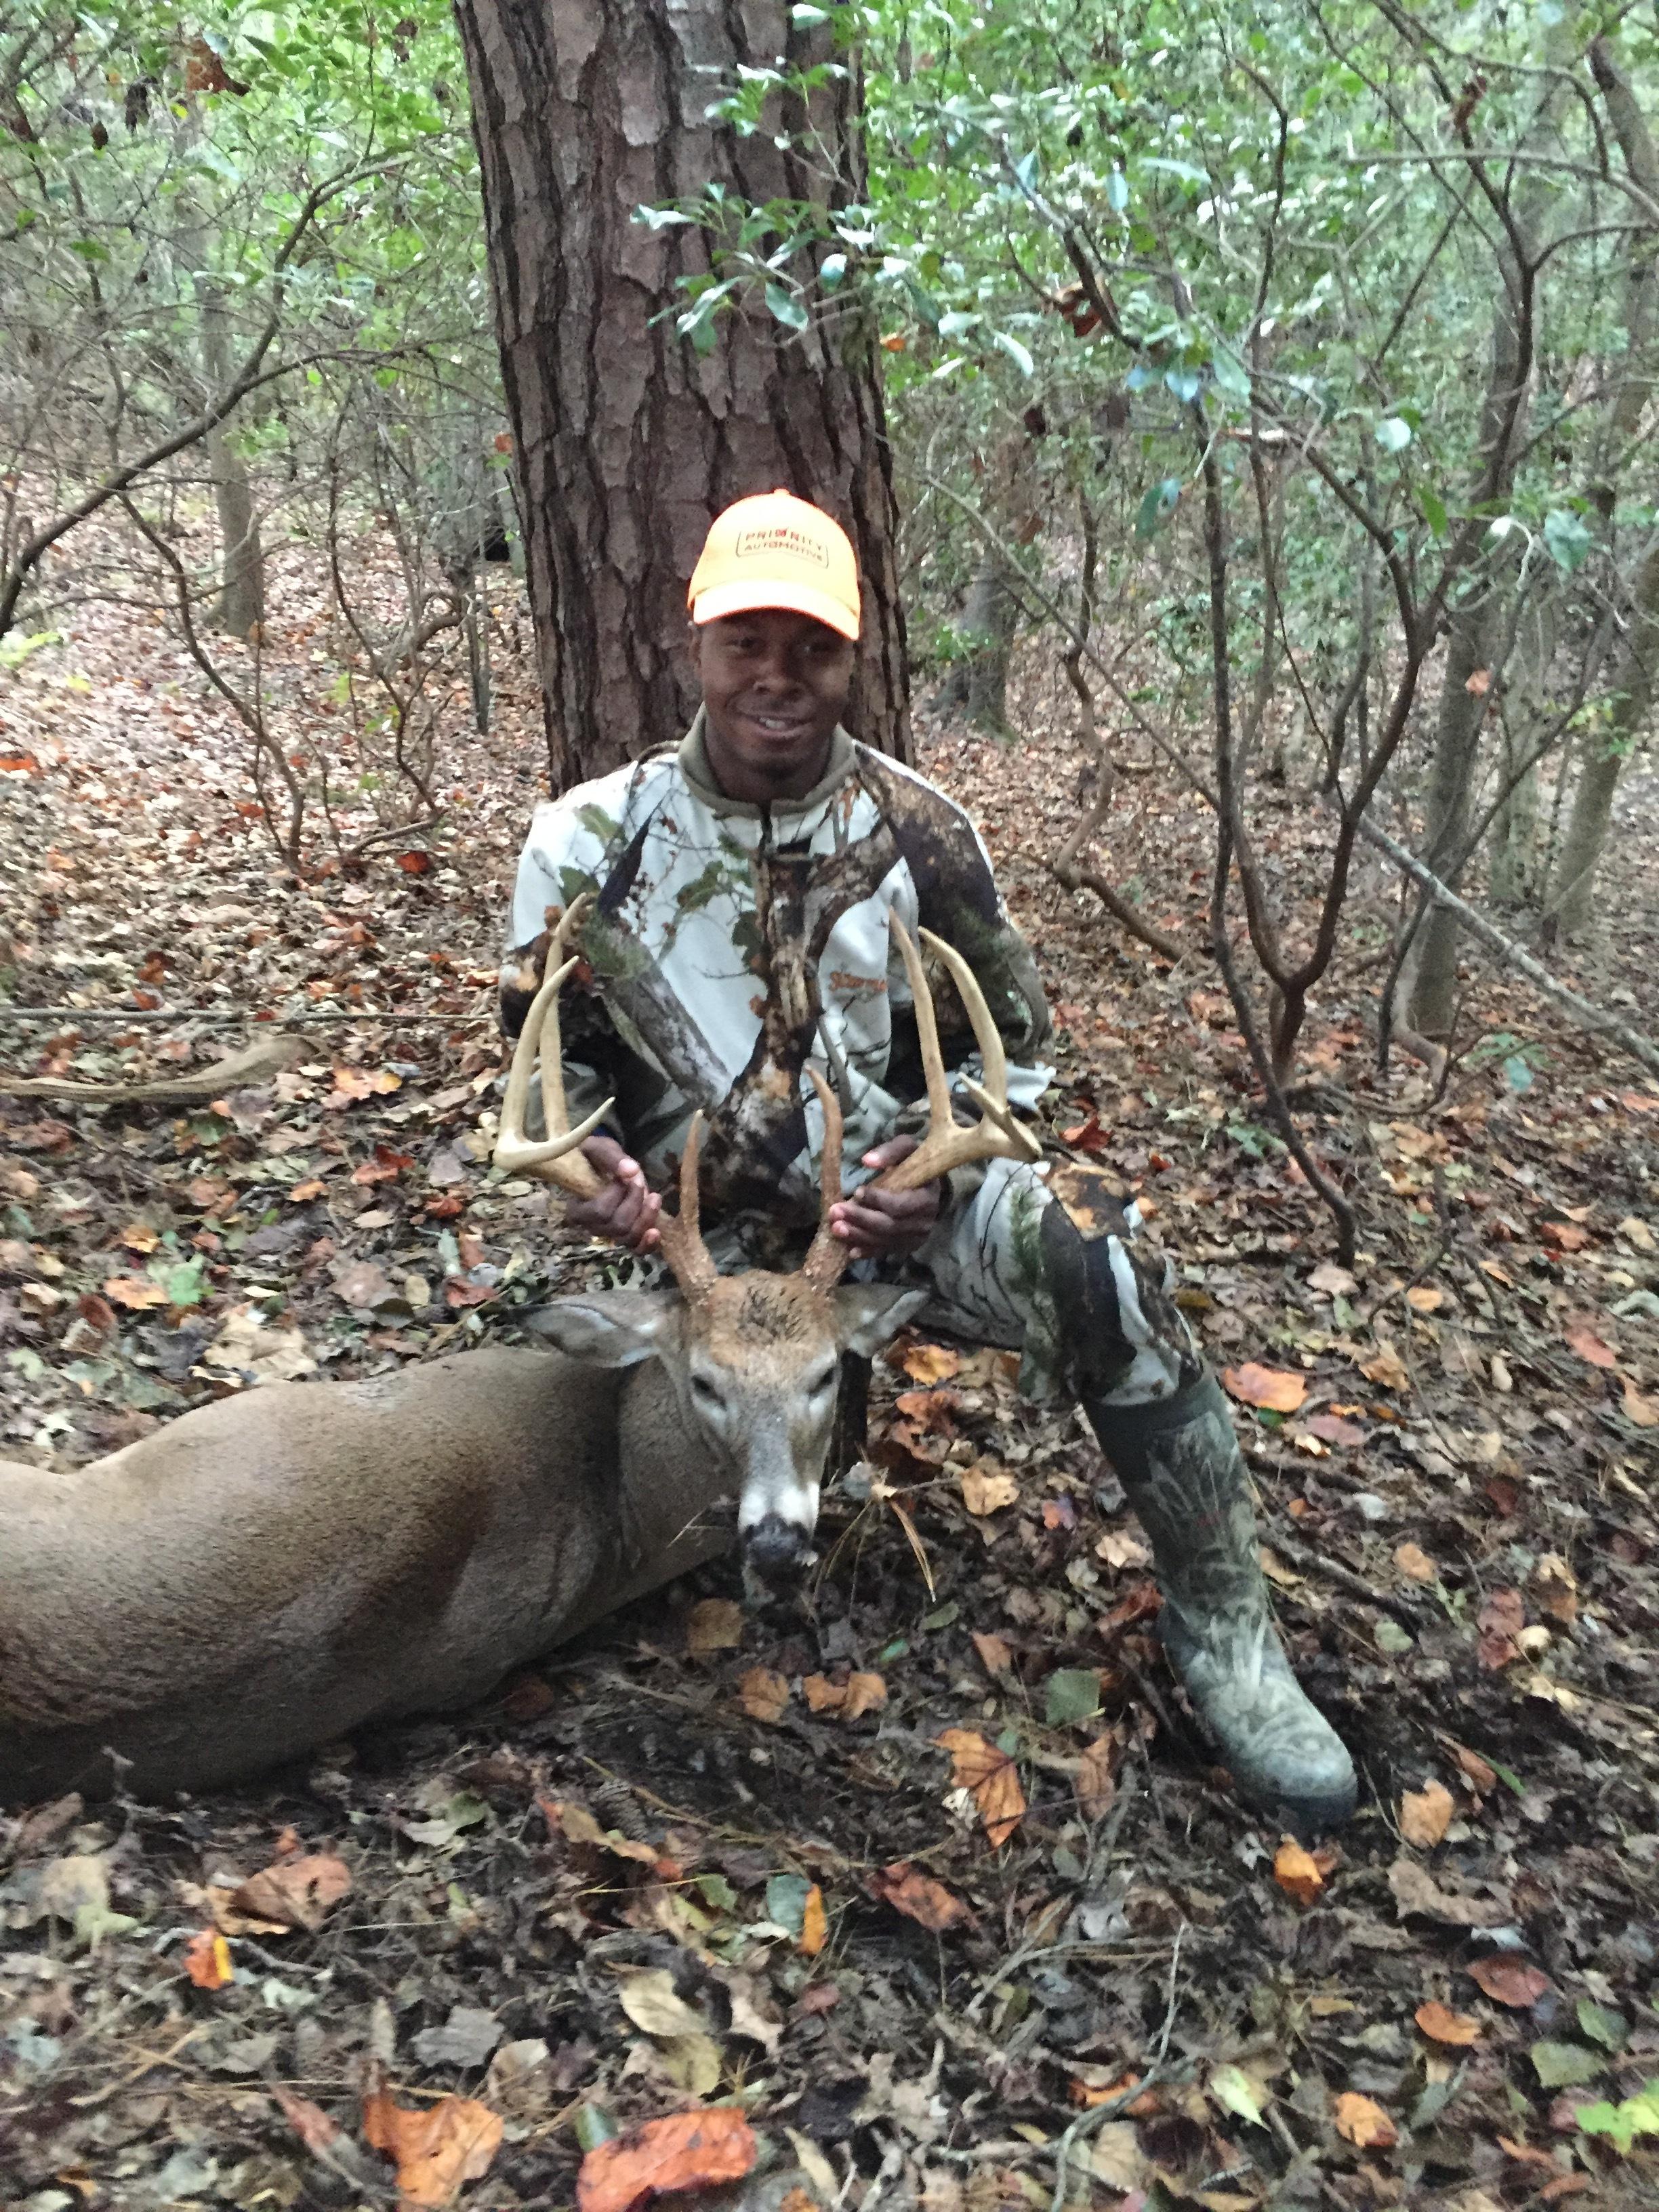 Walter Scott Jr. killed this 8 point buck in Suffolk on 10/17/15